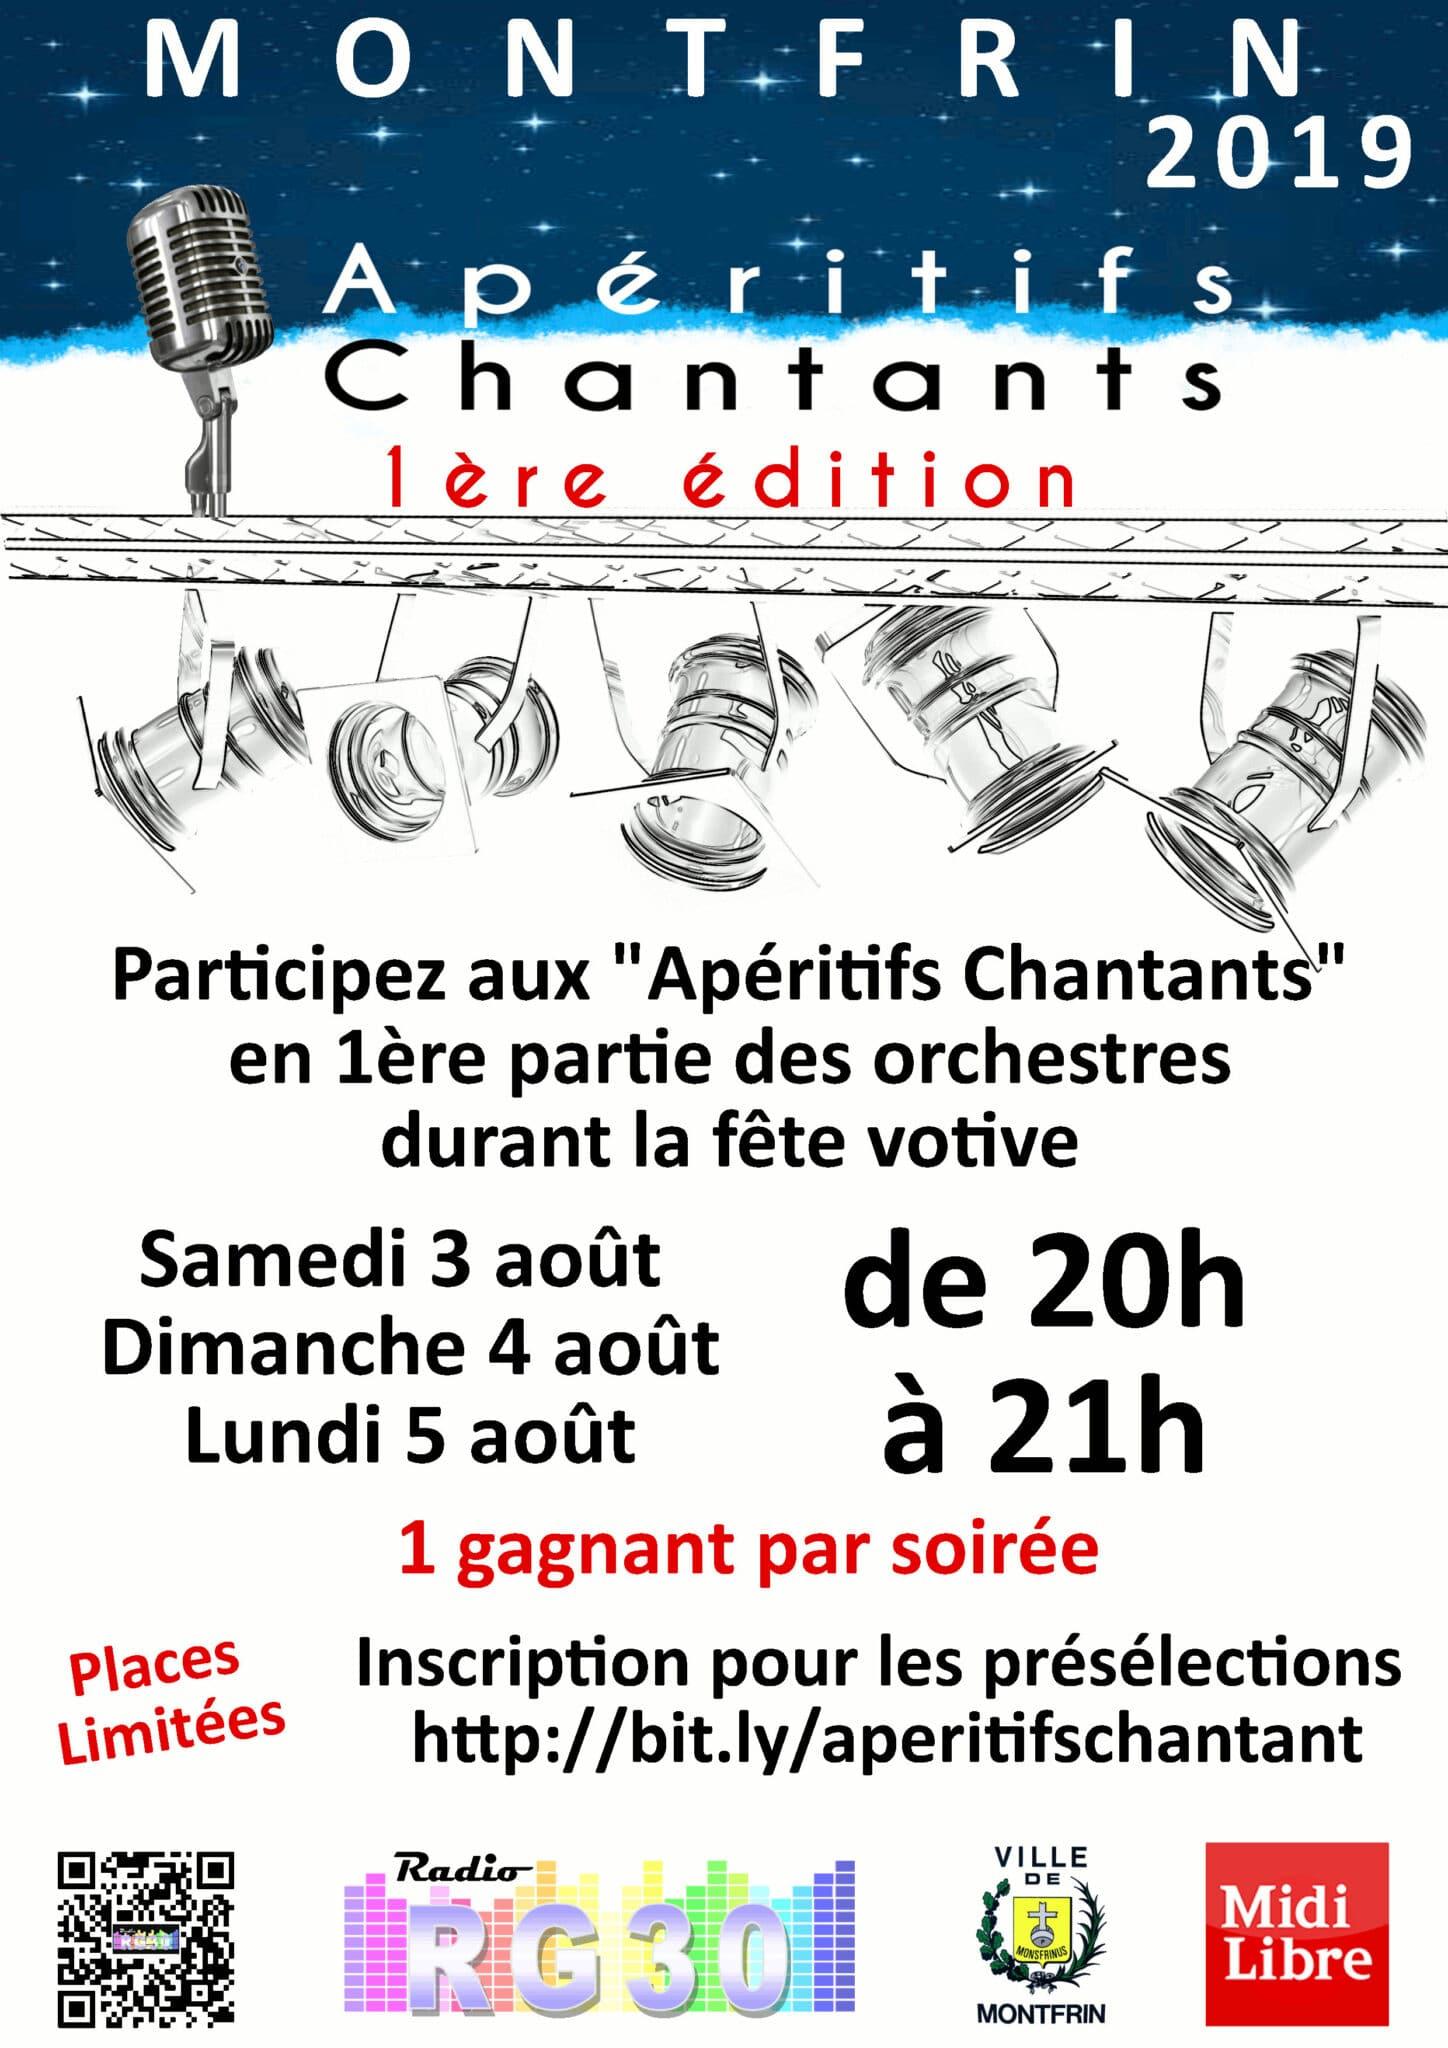 Les Apéritifs Chantants Montfrin 2019